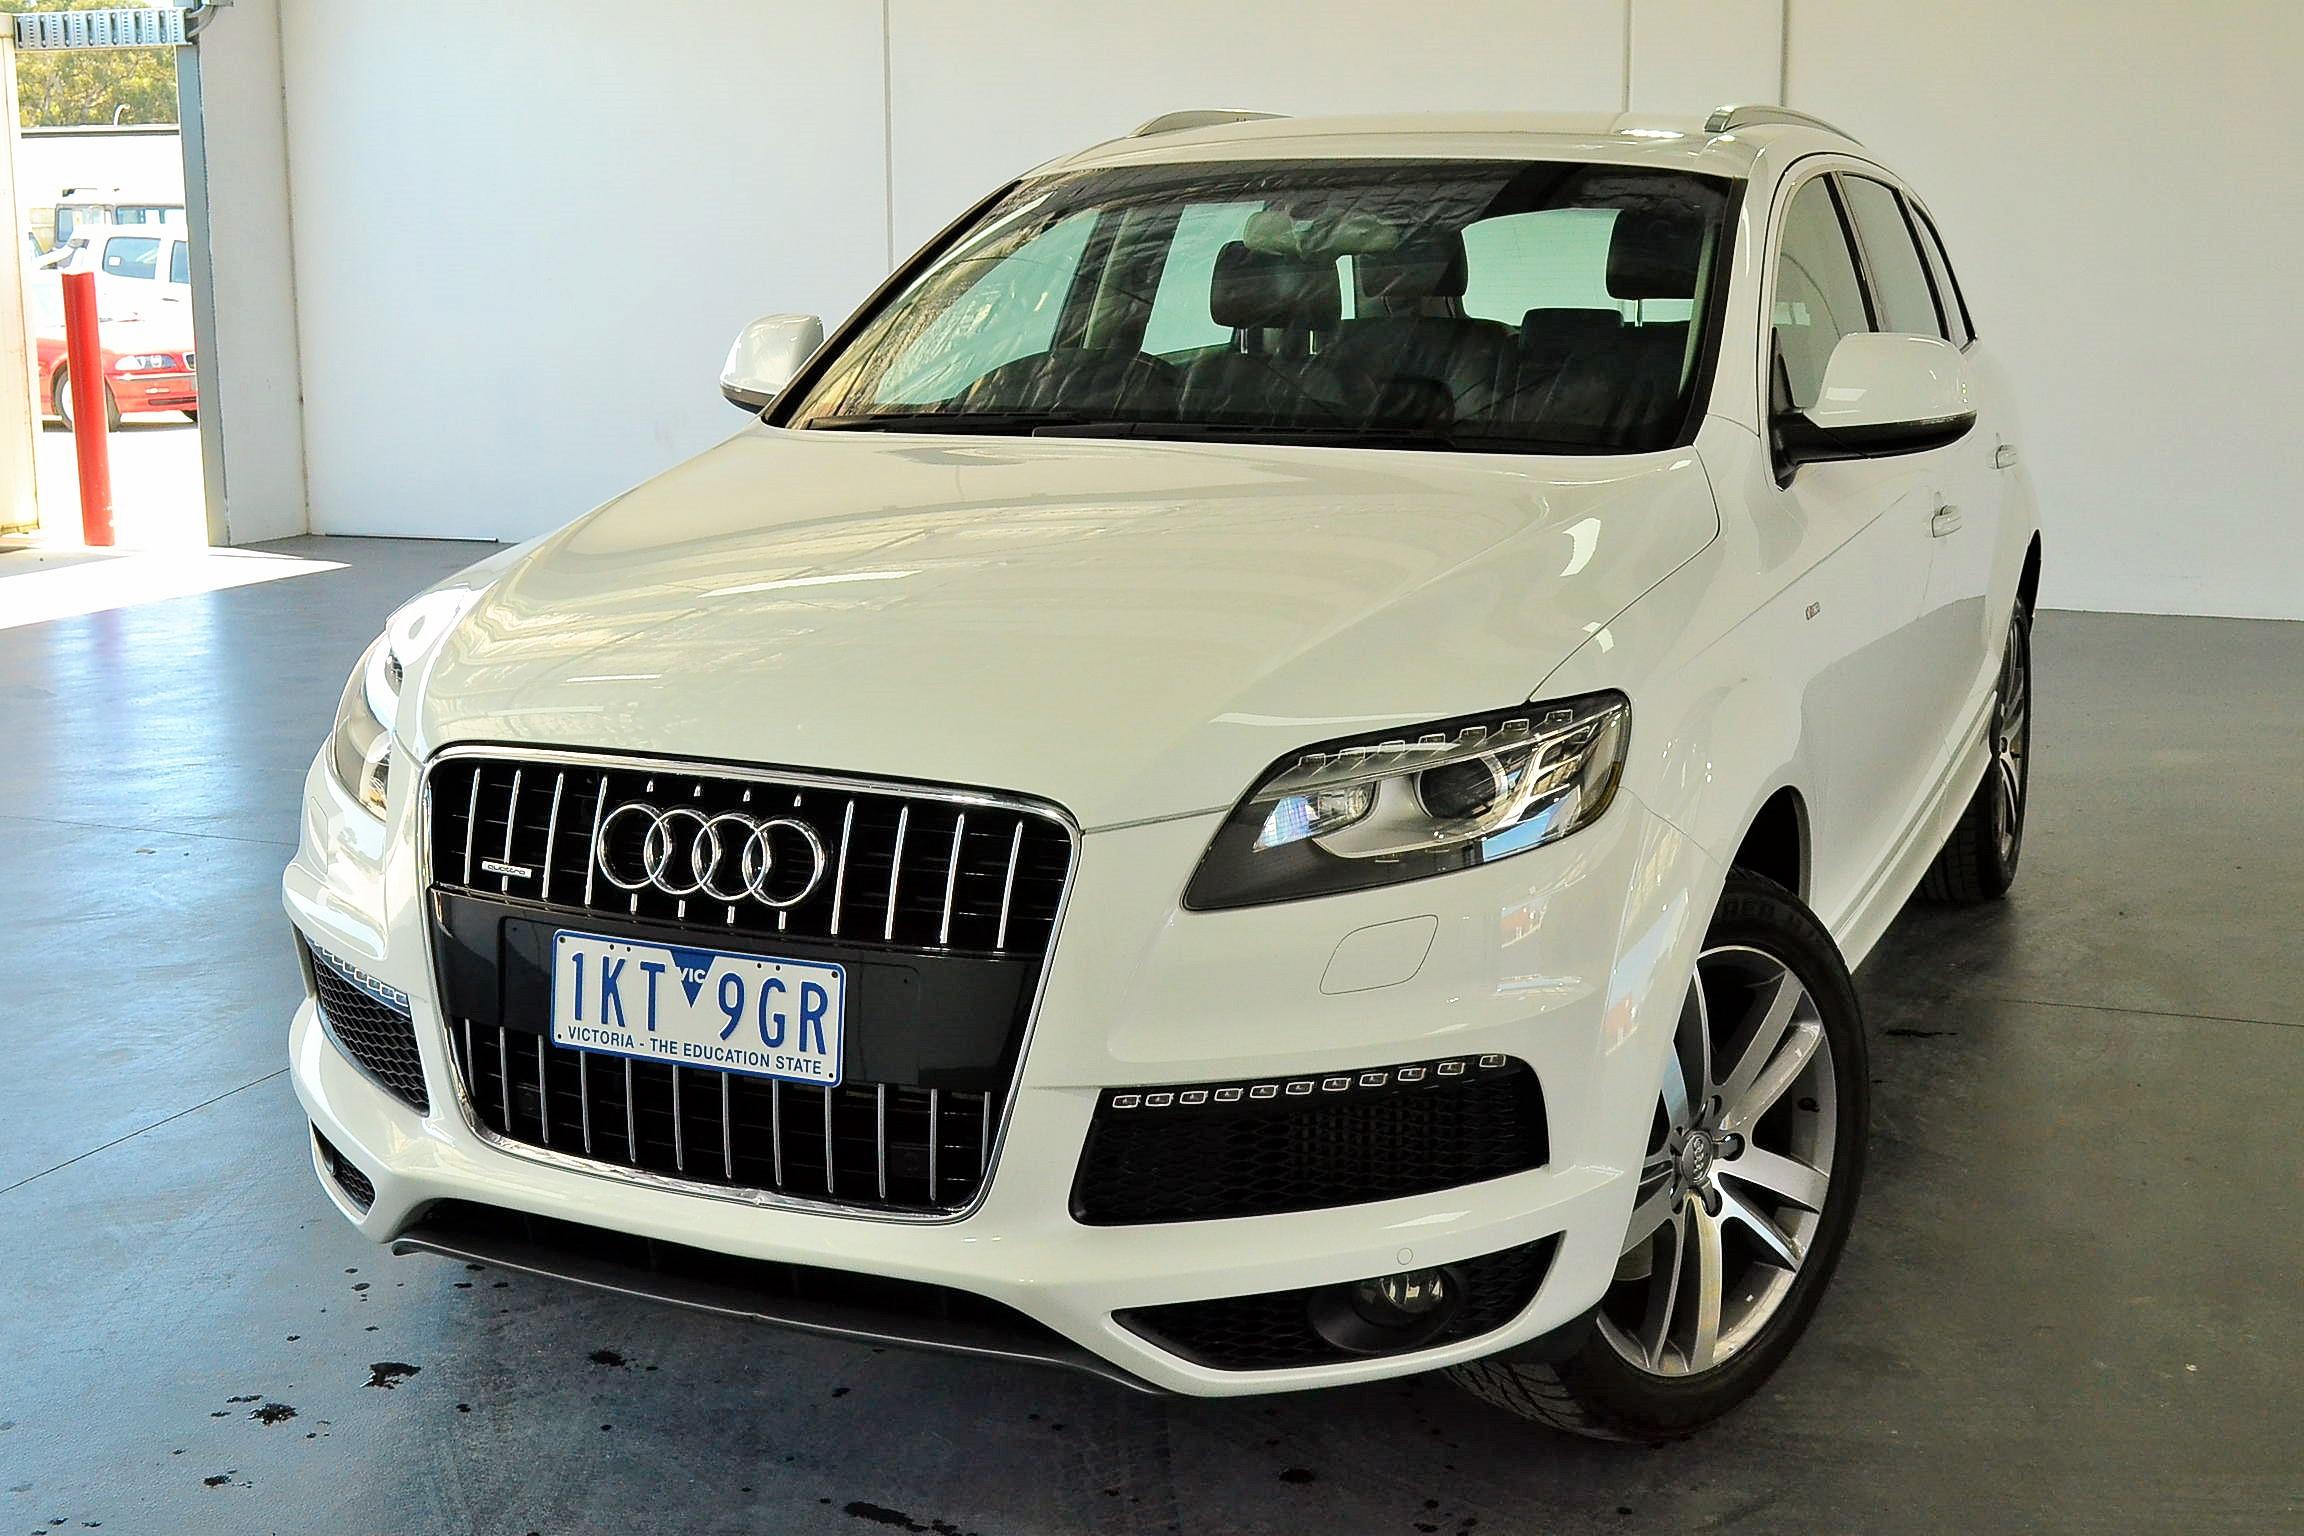 Audi Cars Price List Graysonline - Audi a series price list